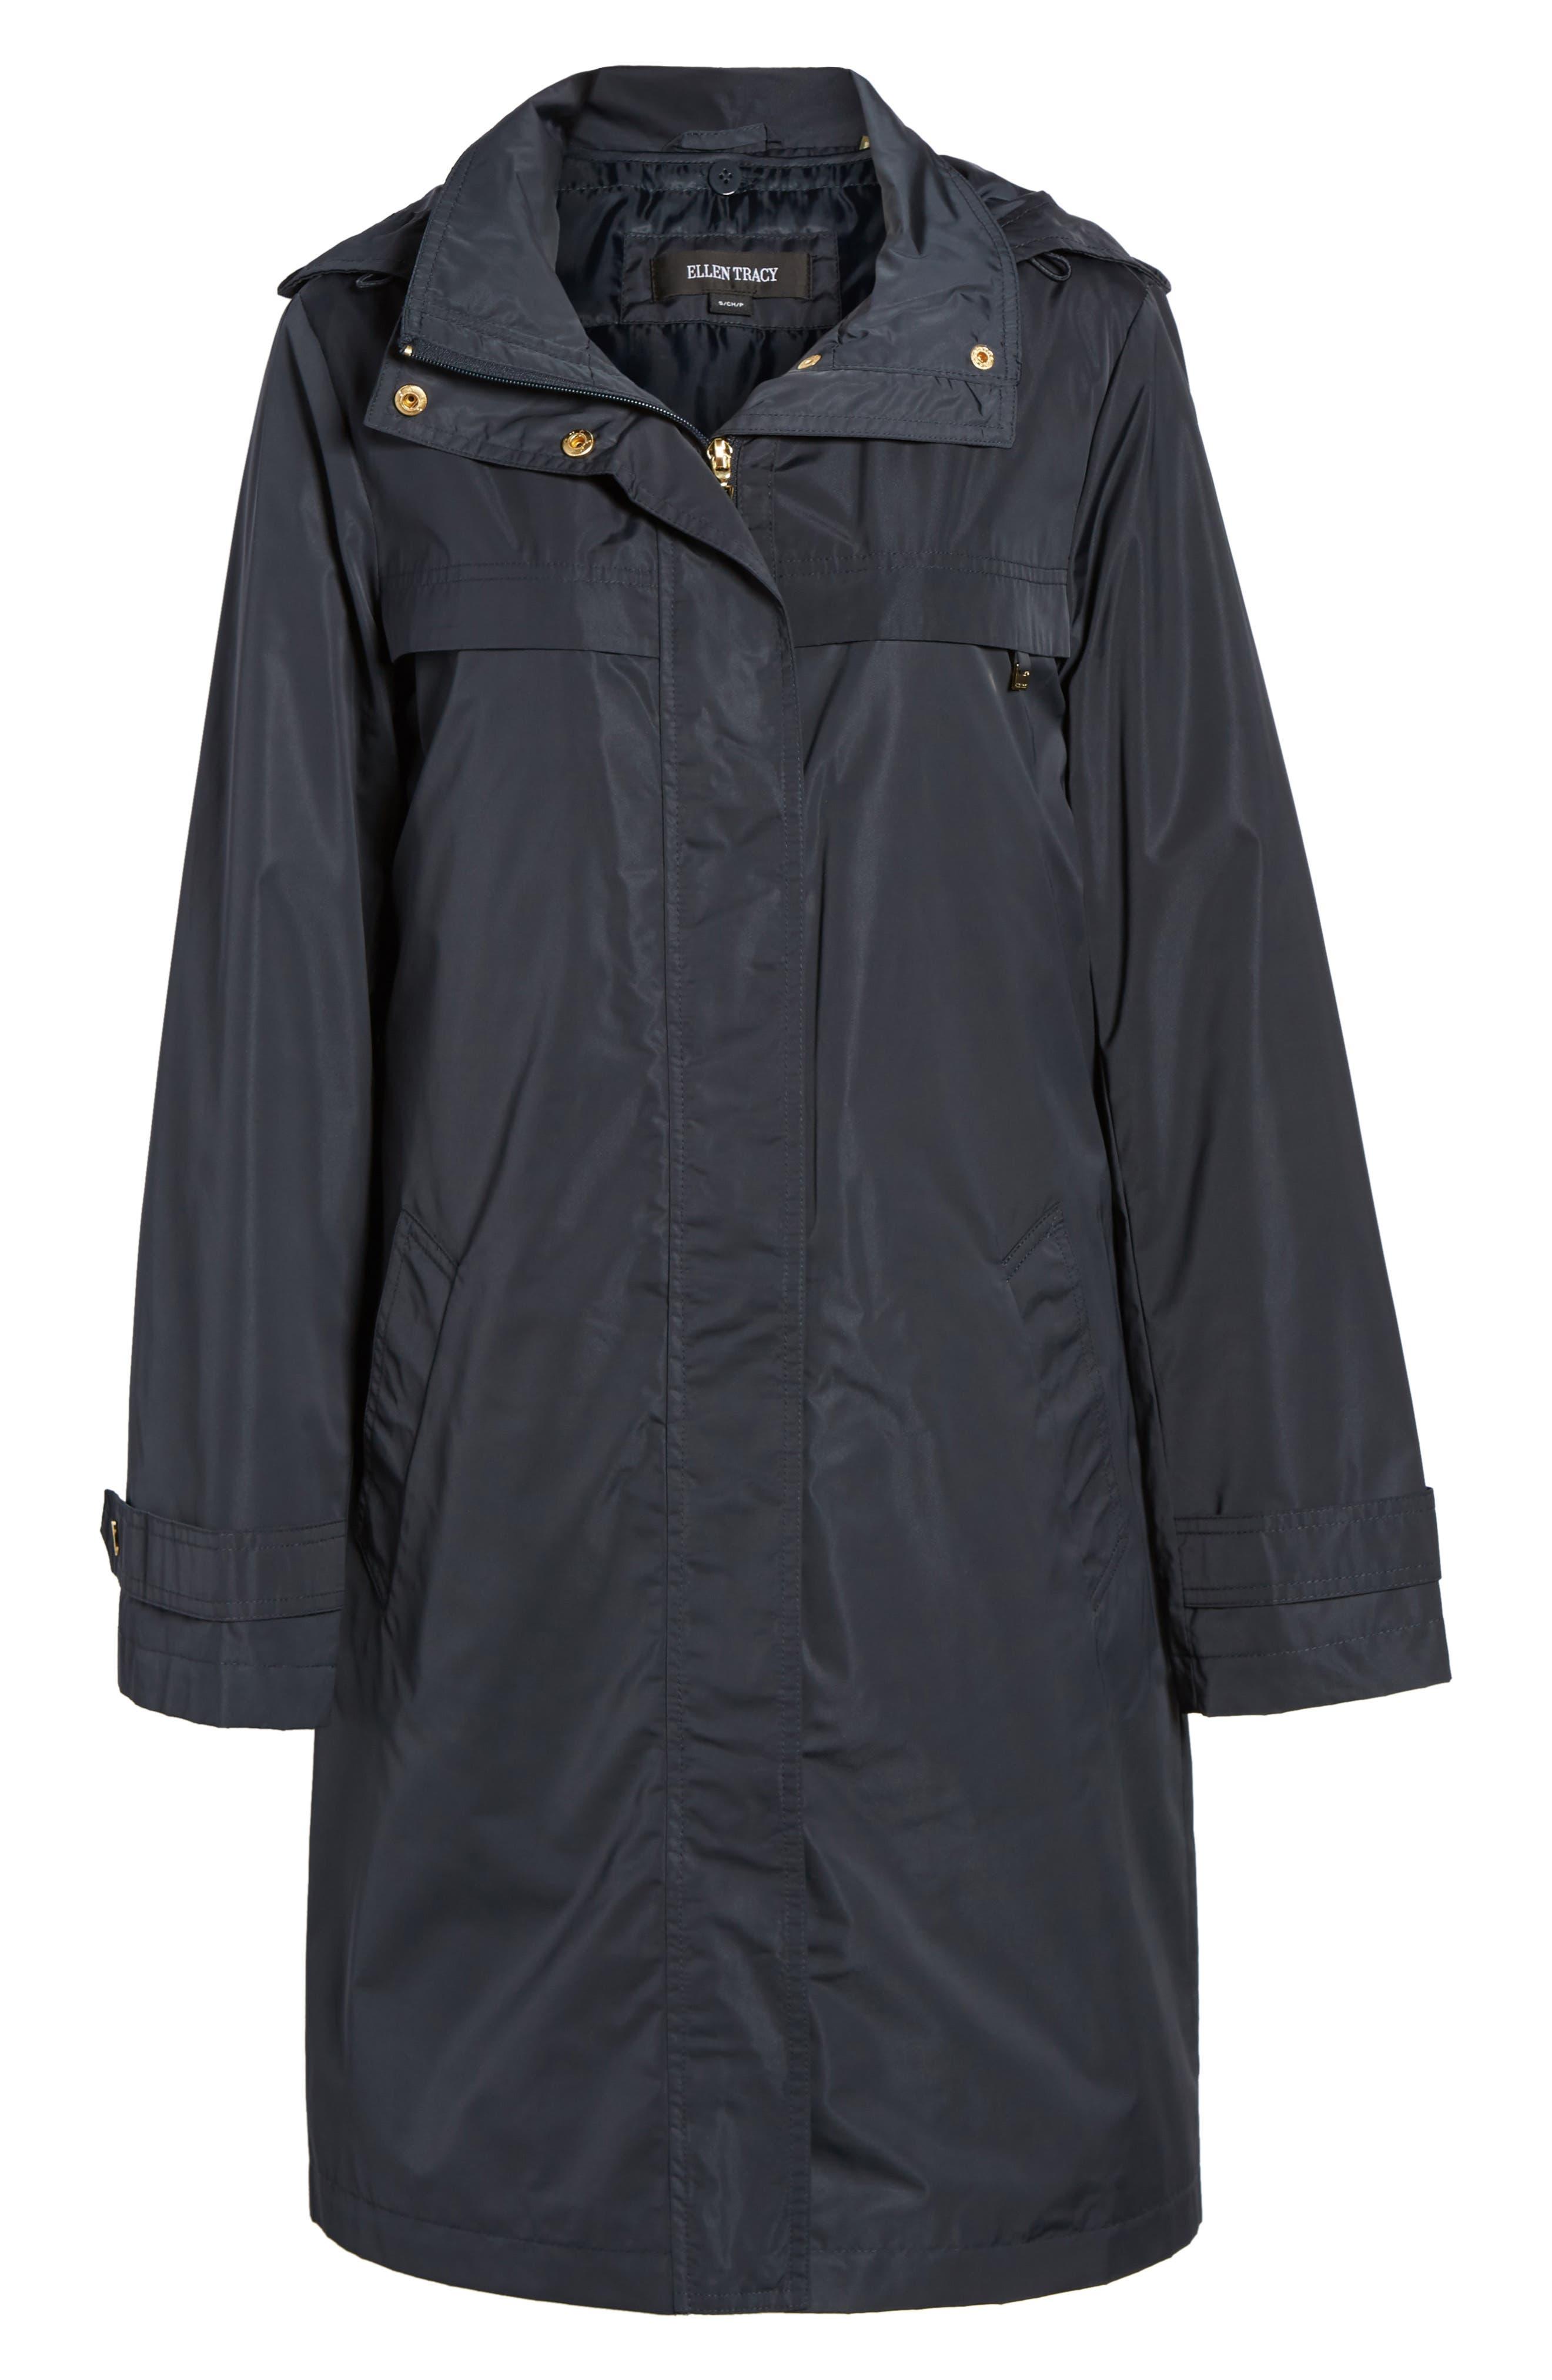 ELLEN TRACY,                             Raincoat with Detachable Hood,                             Alternate thumbnail 5, color,                             410